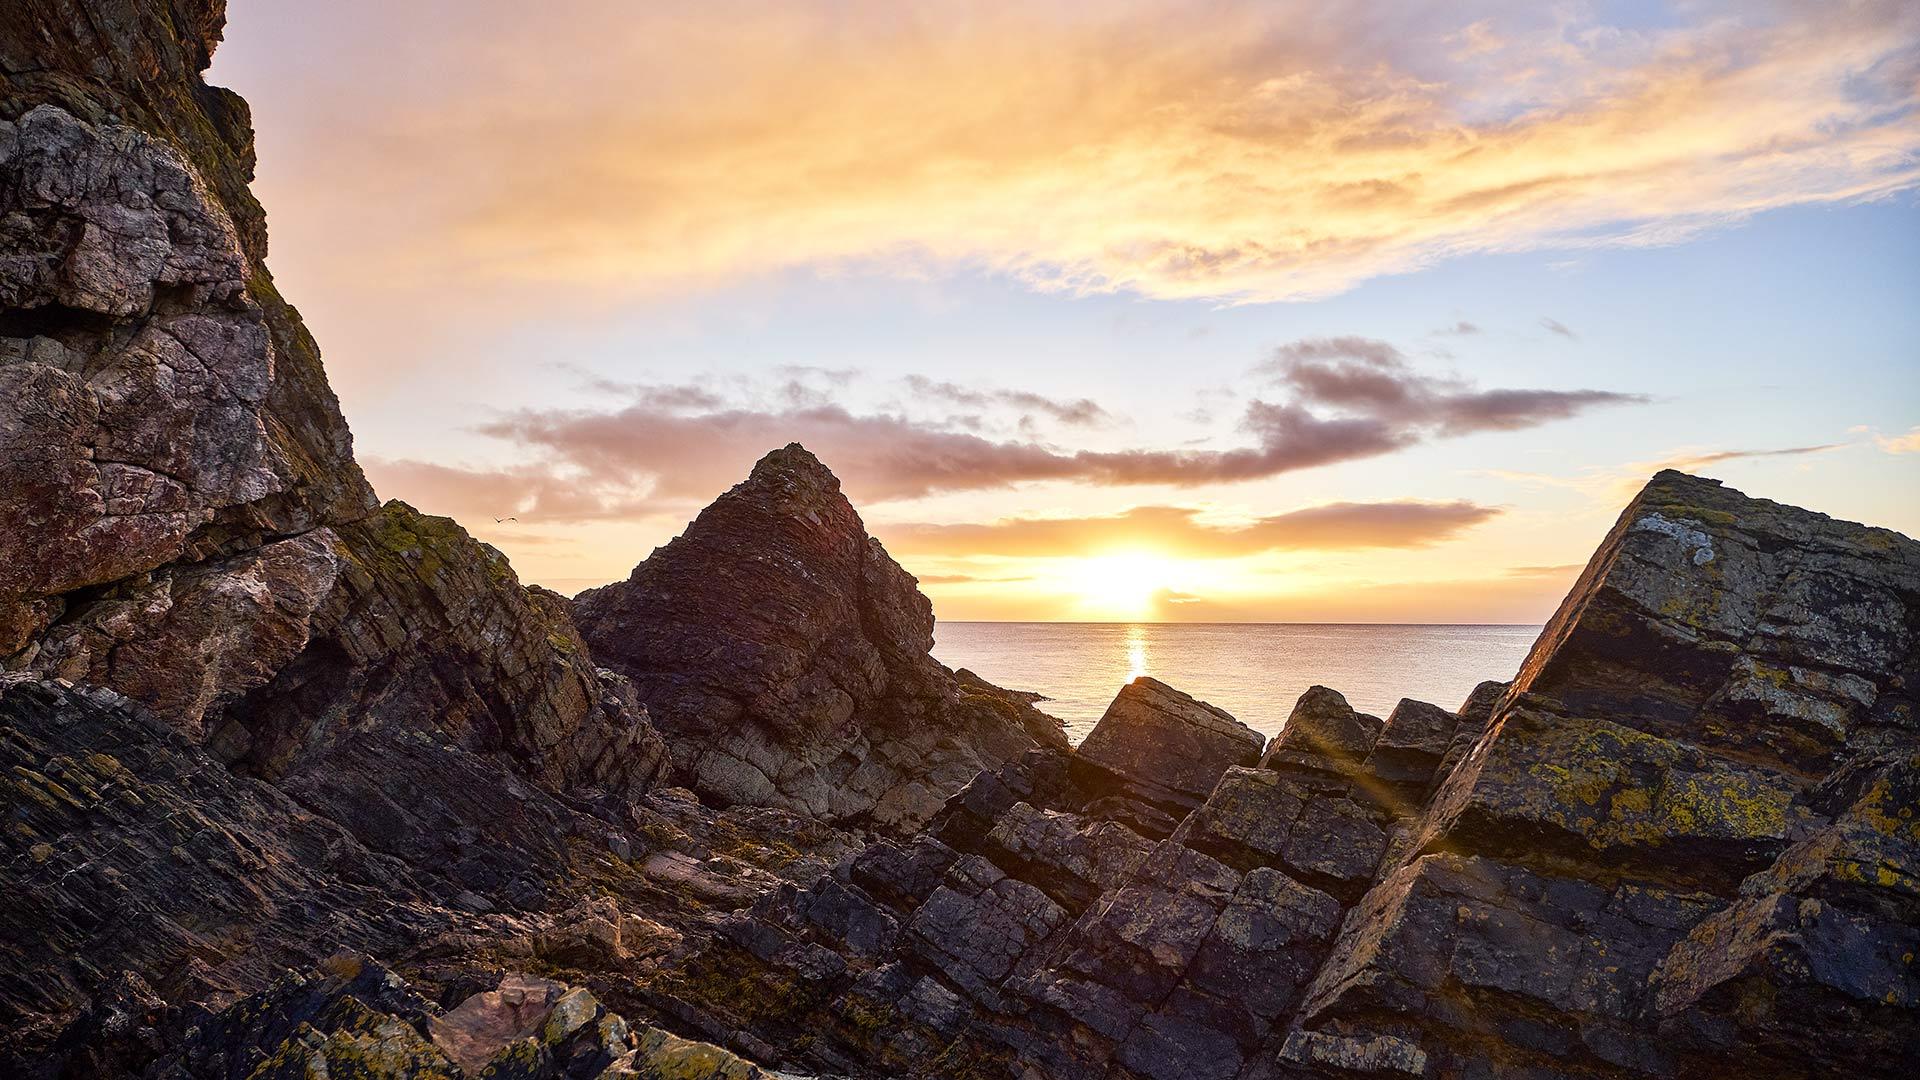 PDJPhoto, Peter de Jong, sluisweg 59, 2225 xj, Katwijk, 2018, Scotland, Roadtrip, the north coast 500, Skye